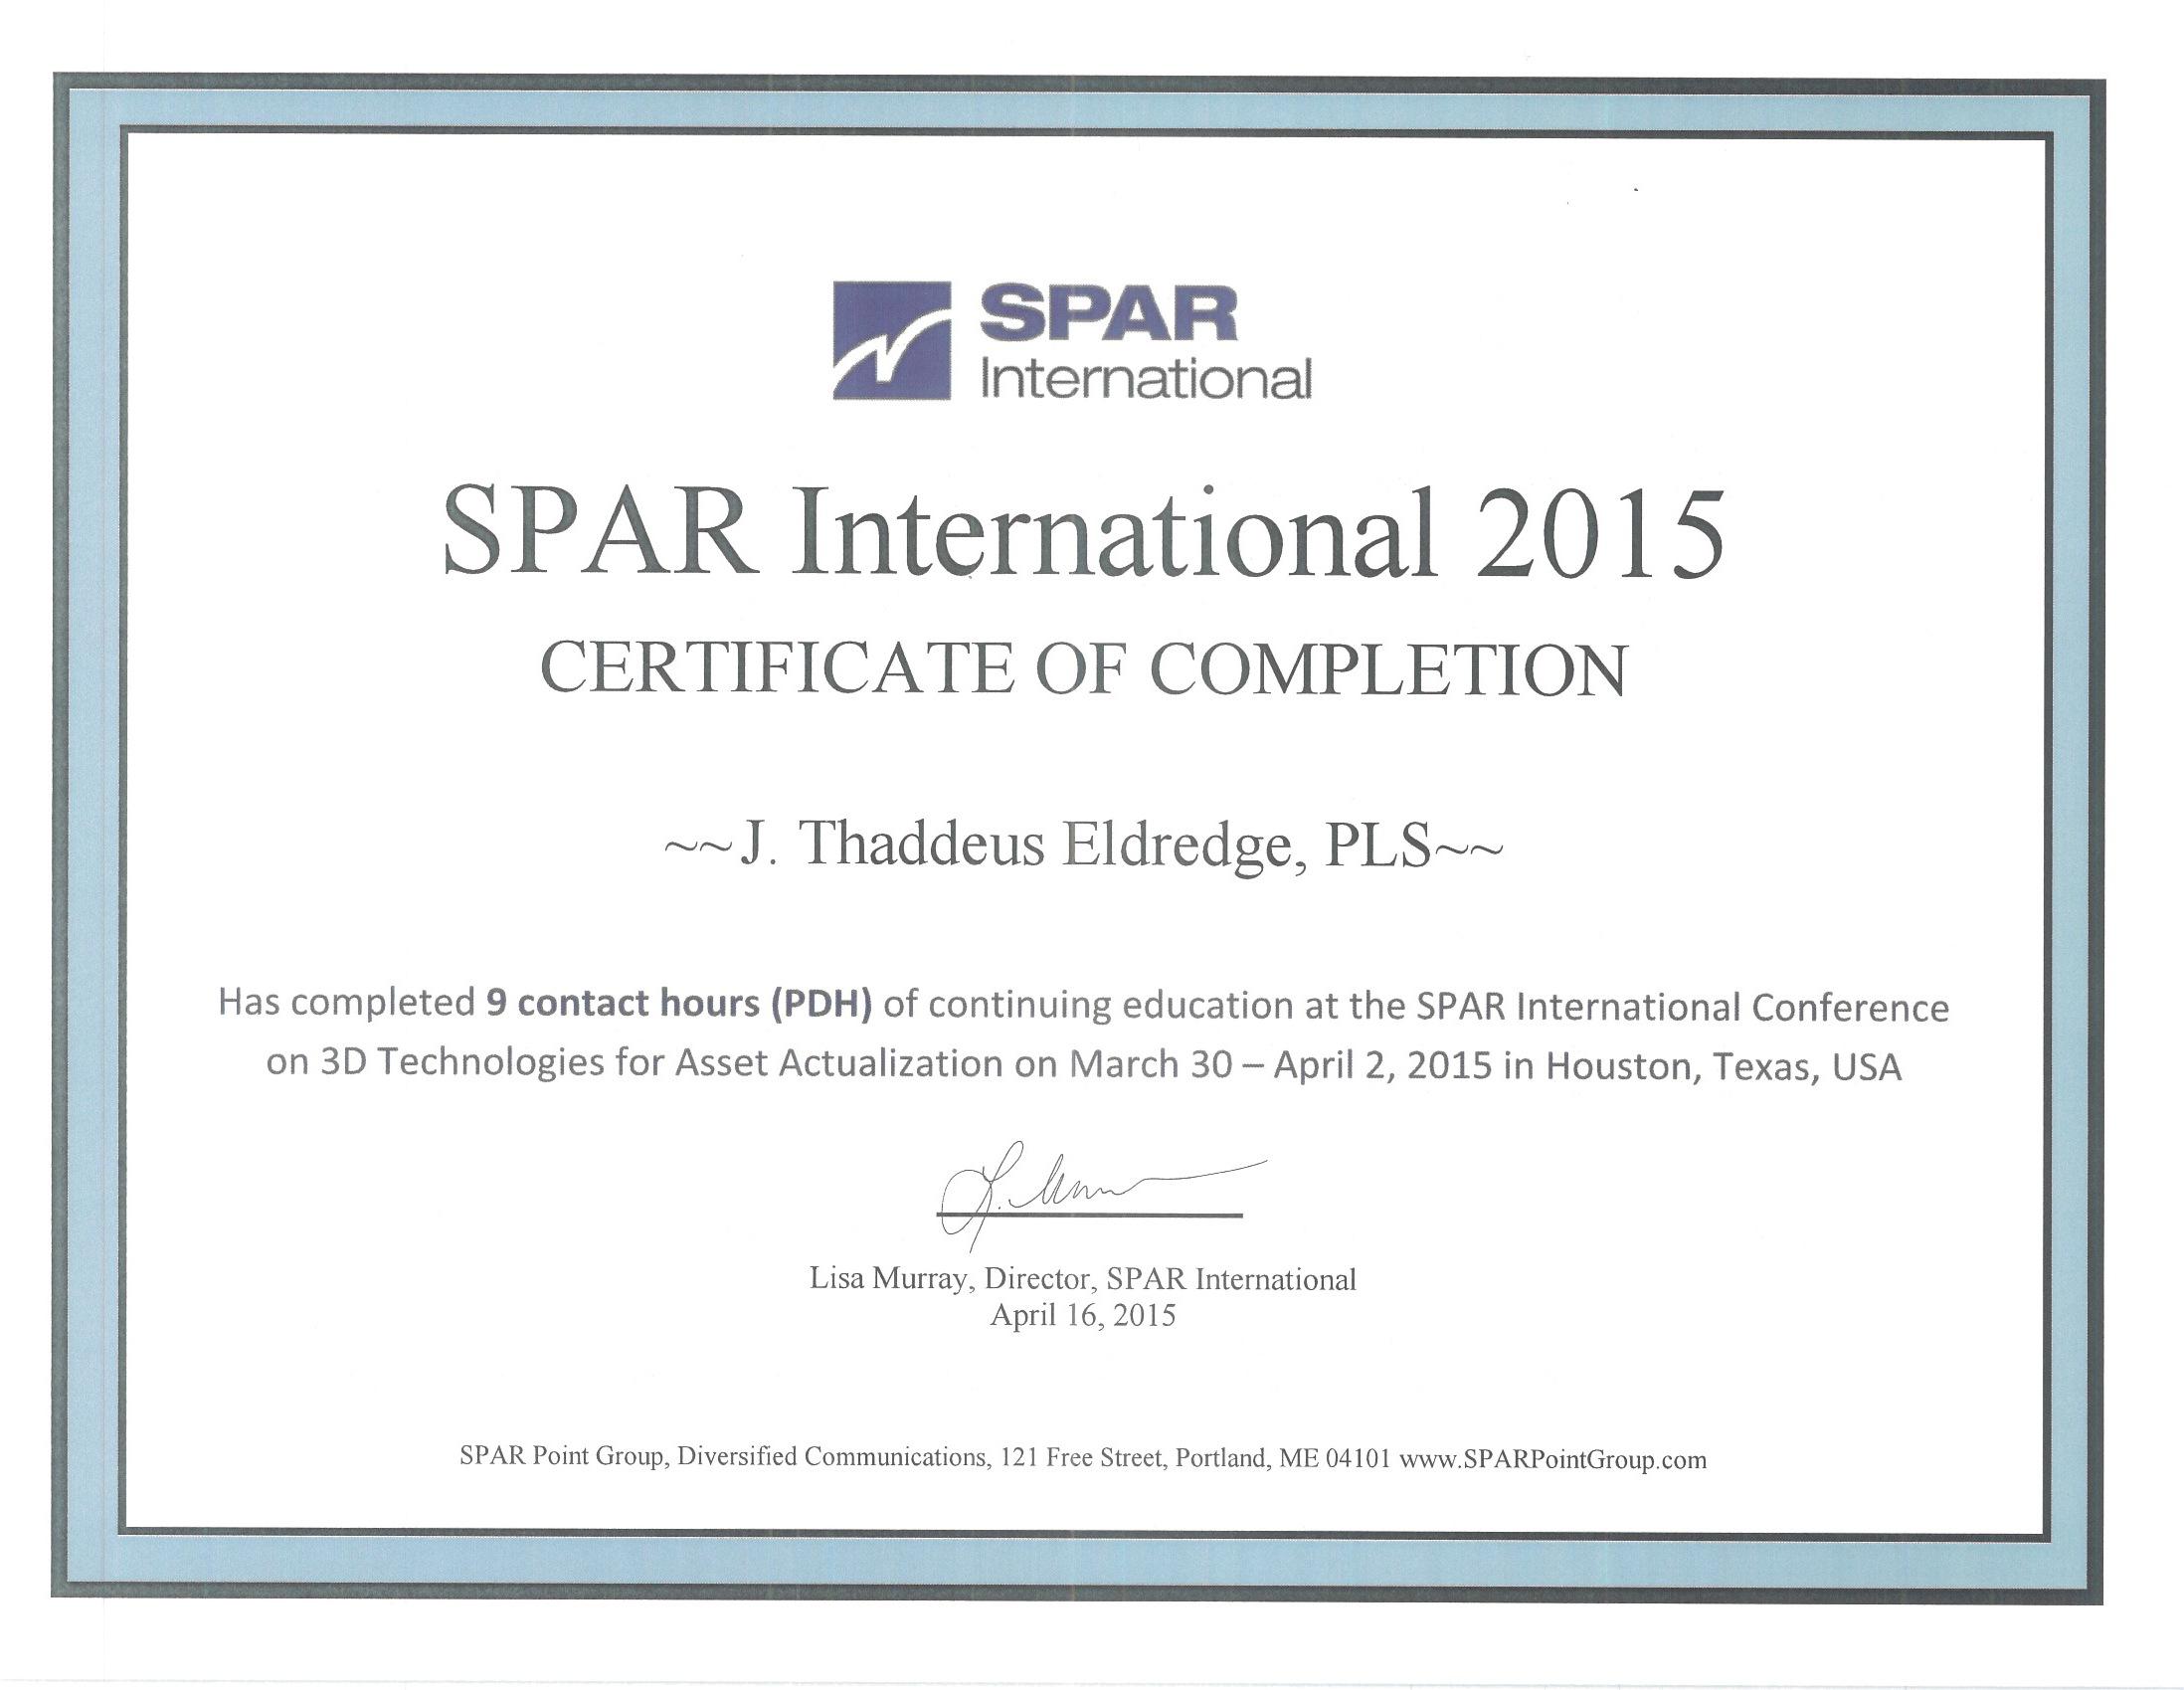 2015-04-16 SPAR.jpg